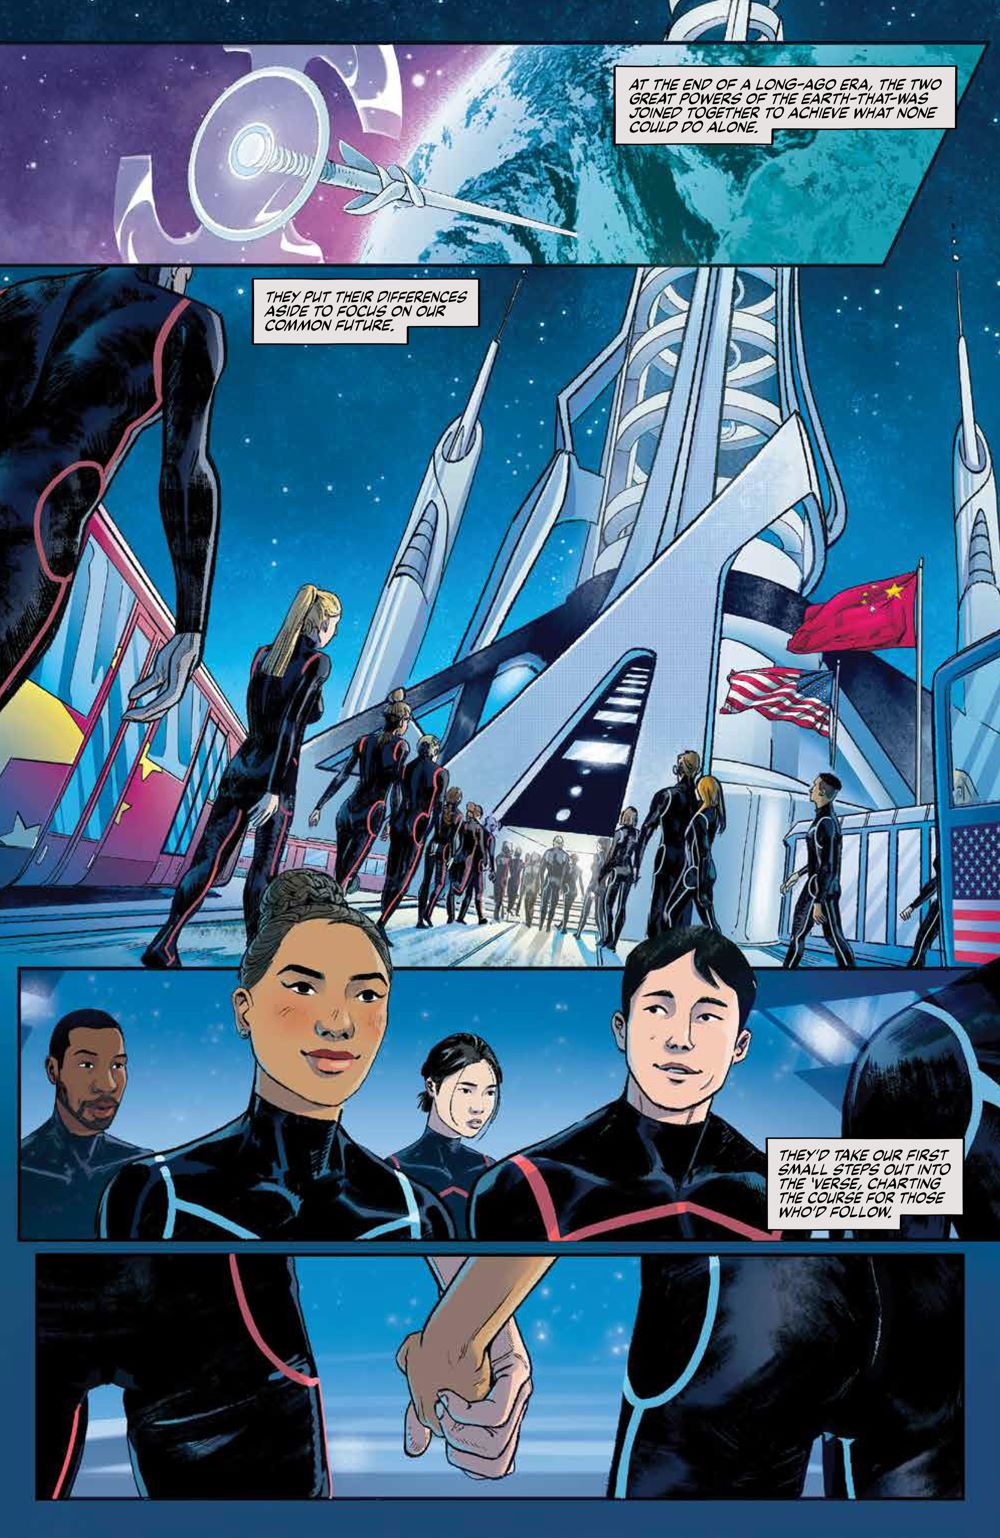 Firefly_BrandNewVerse_001_PRESS_3 ComicList Previews: FIREFLY BRAND NEW 'VERSE #1